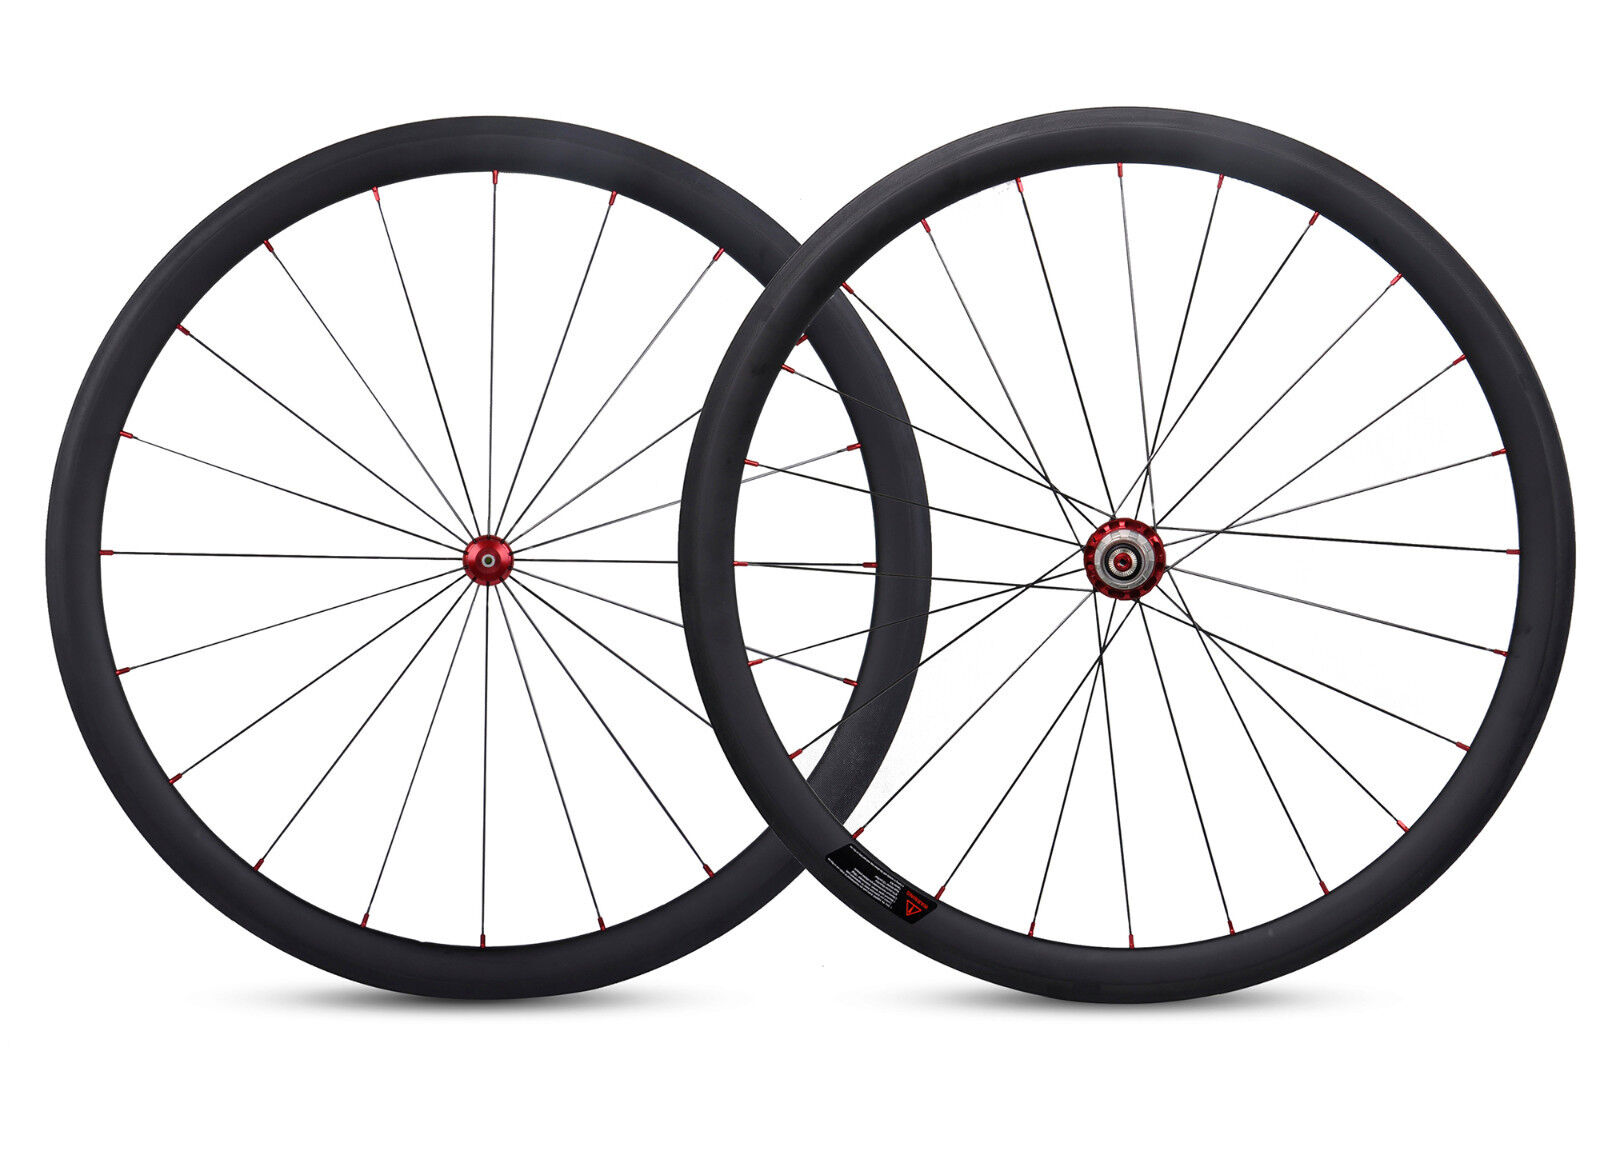 1355g 38mm Sapim Carbon Wheel Clincher Powerway R36 UD Matt  700C Road Bike 23mm  official quality